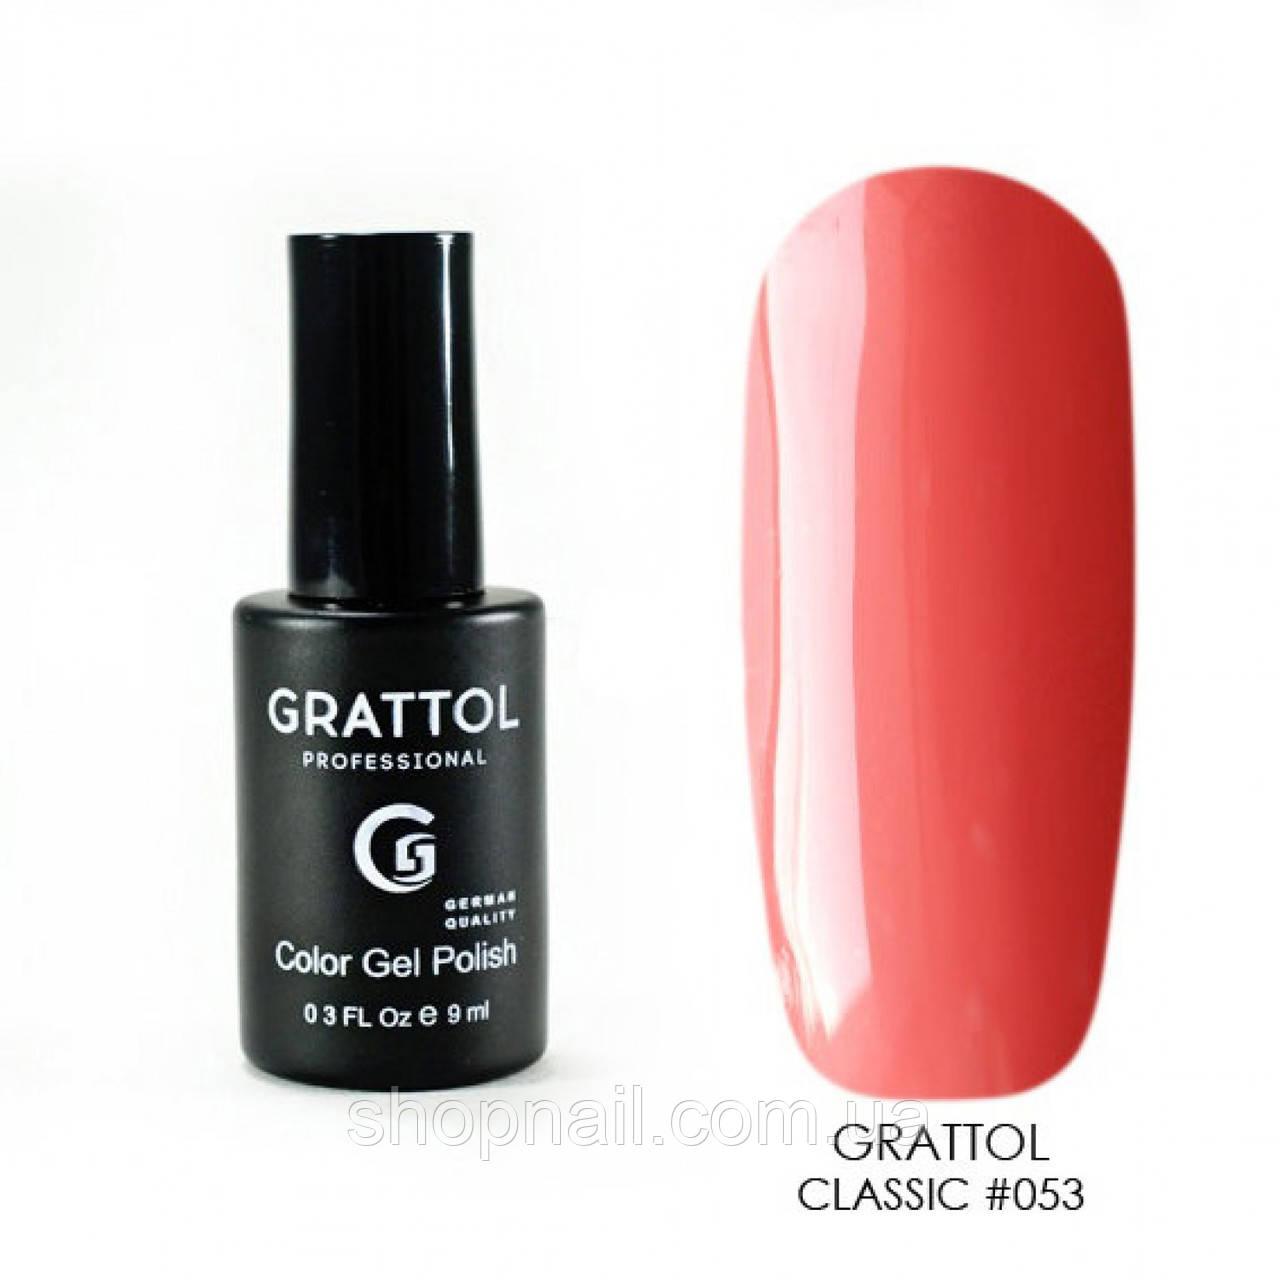 Grattol Gel Polish Dark Coral 9 ml  №053, 9ml